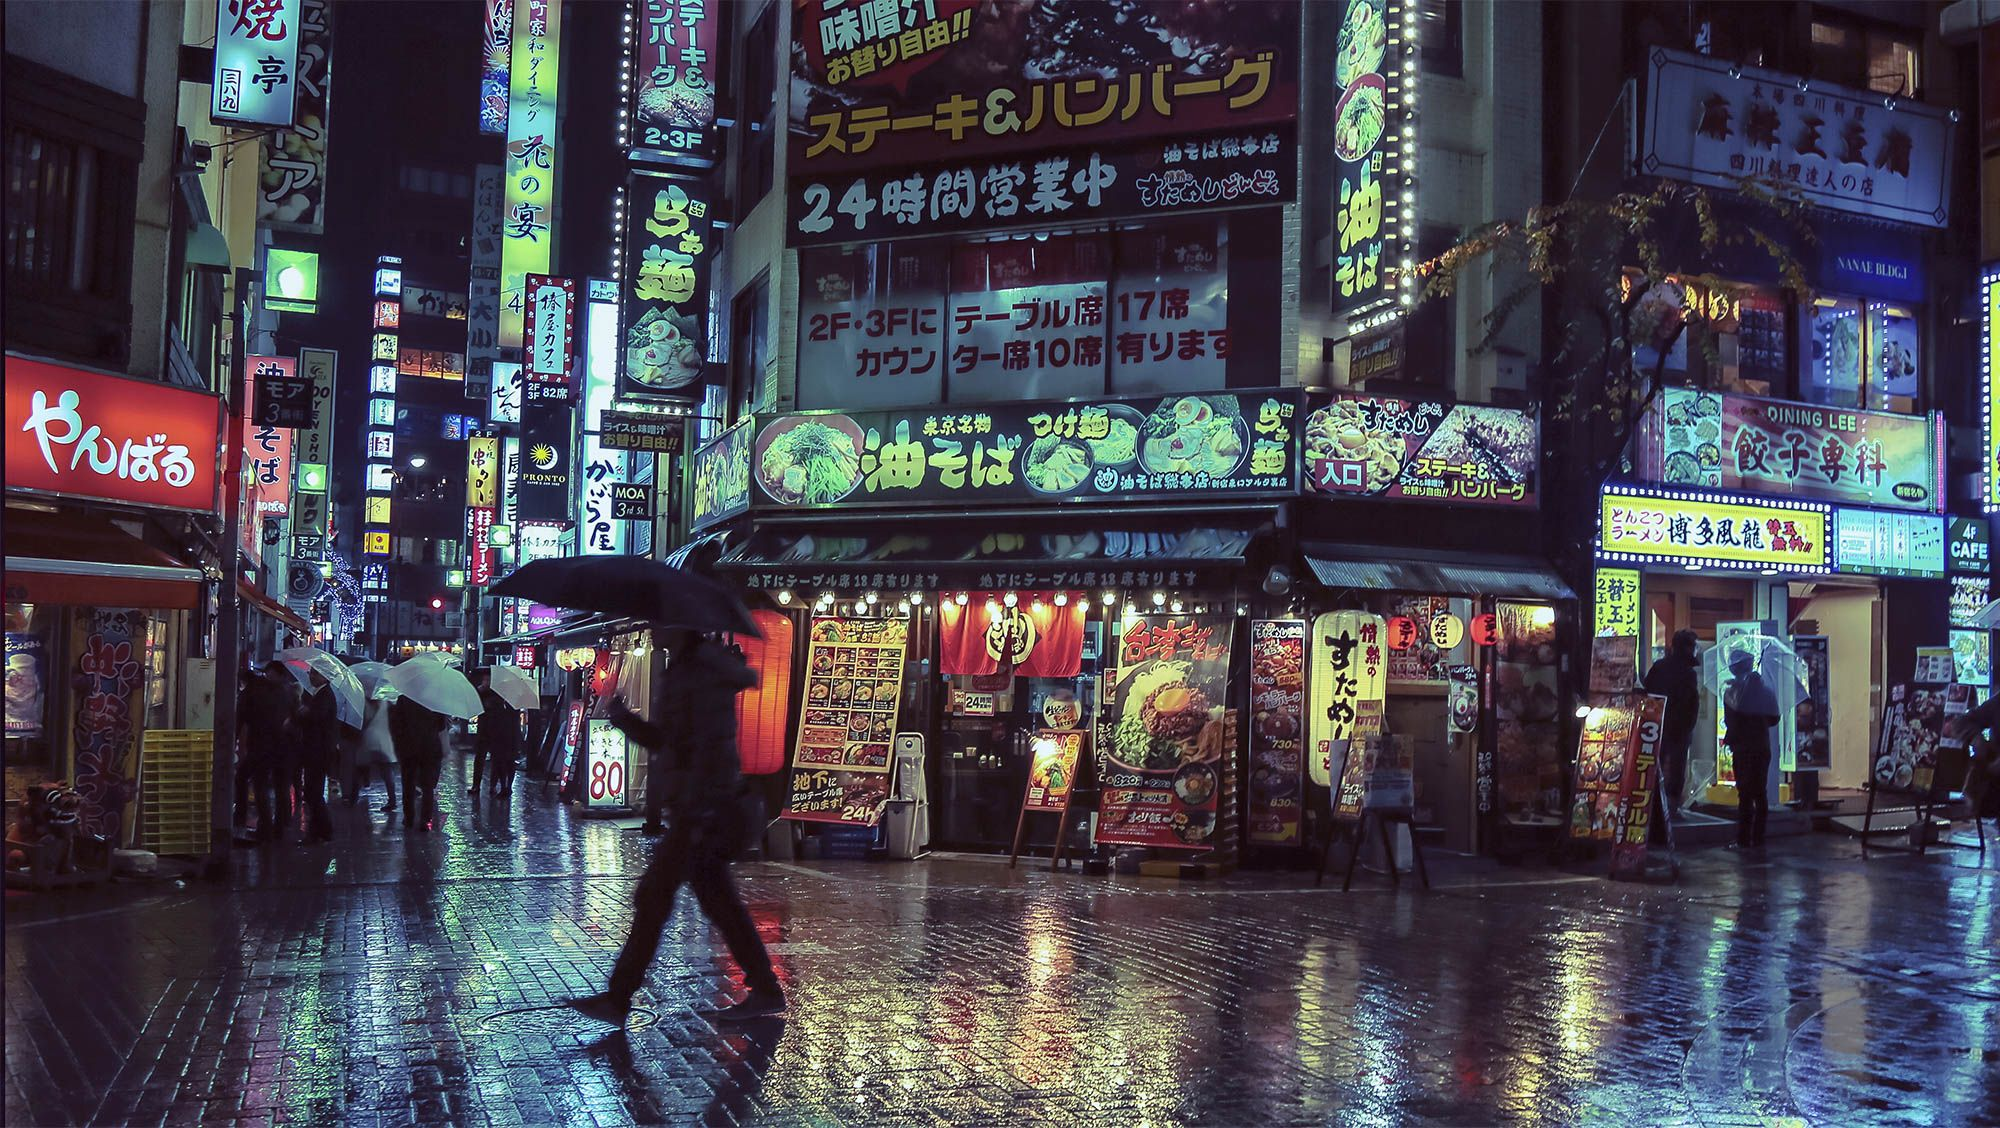 Cyberpunk Japan Wallpapers Top Free Cyberpunk Japan Backgrounds Wallpaperaccess